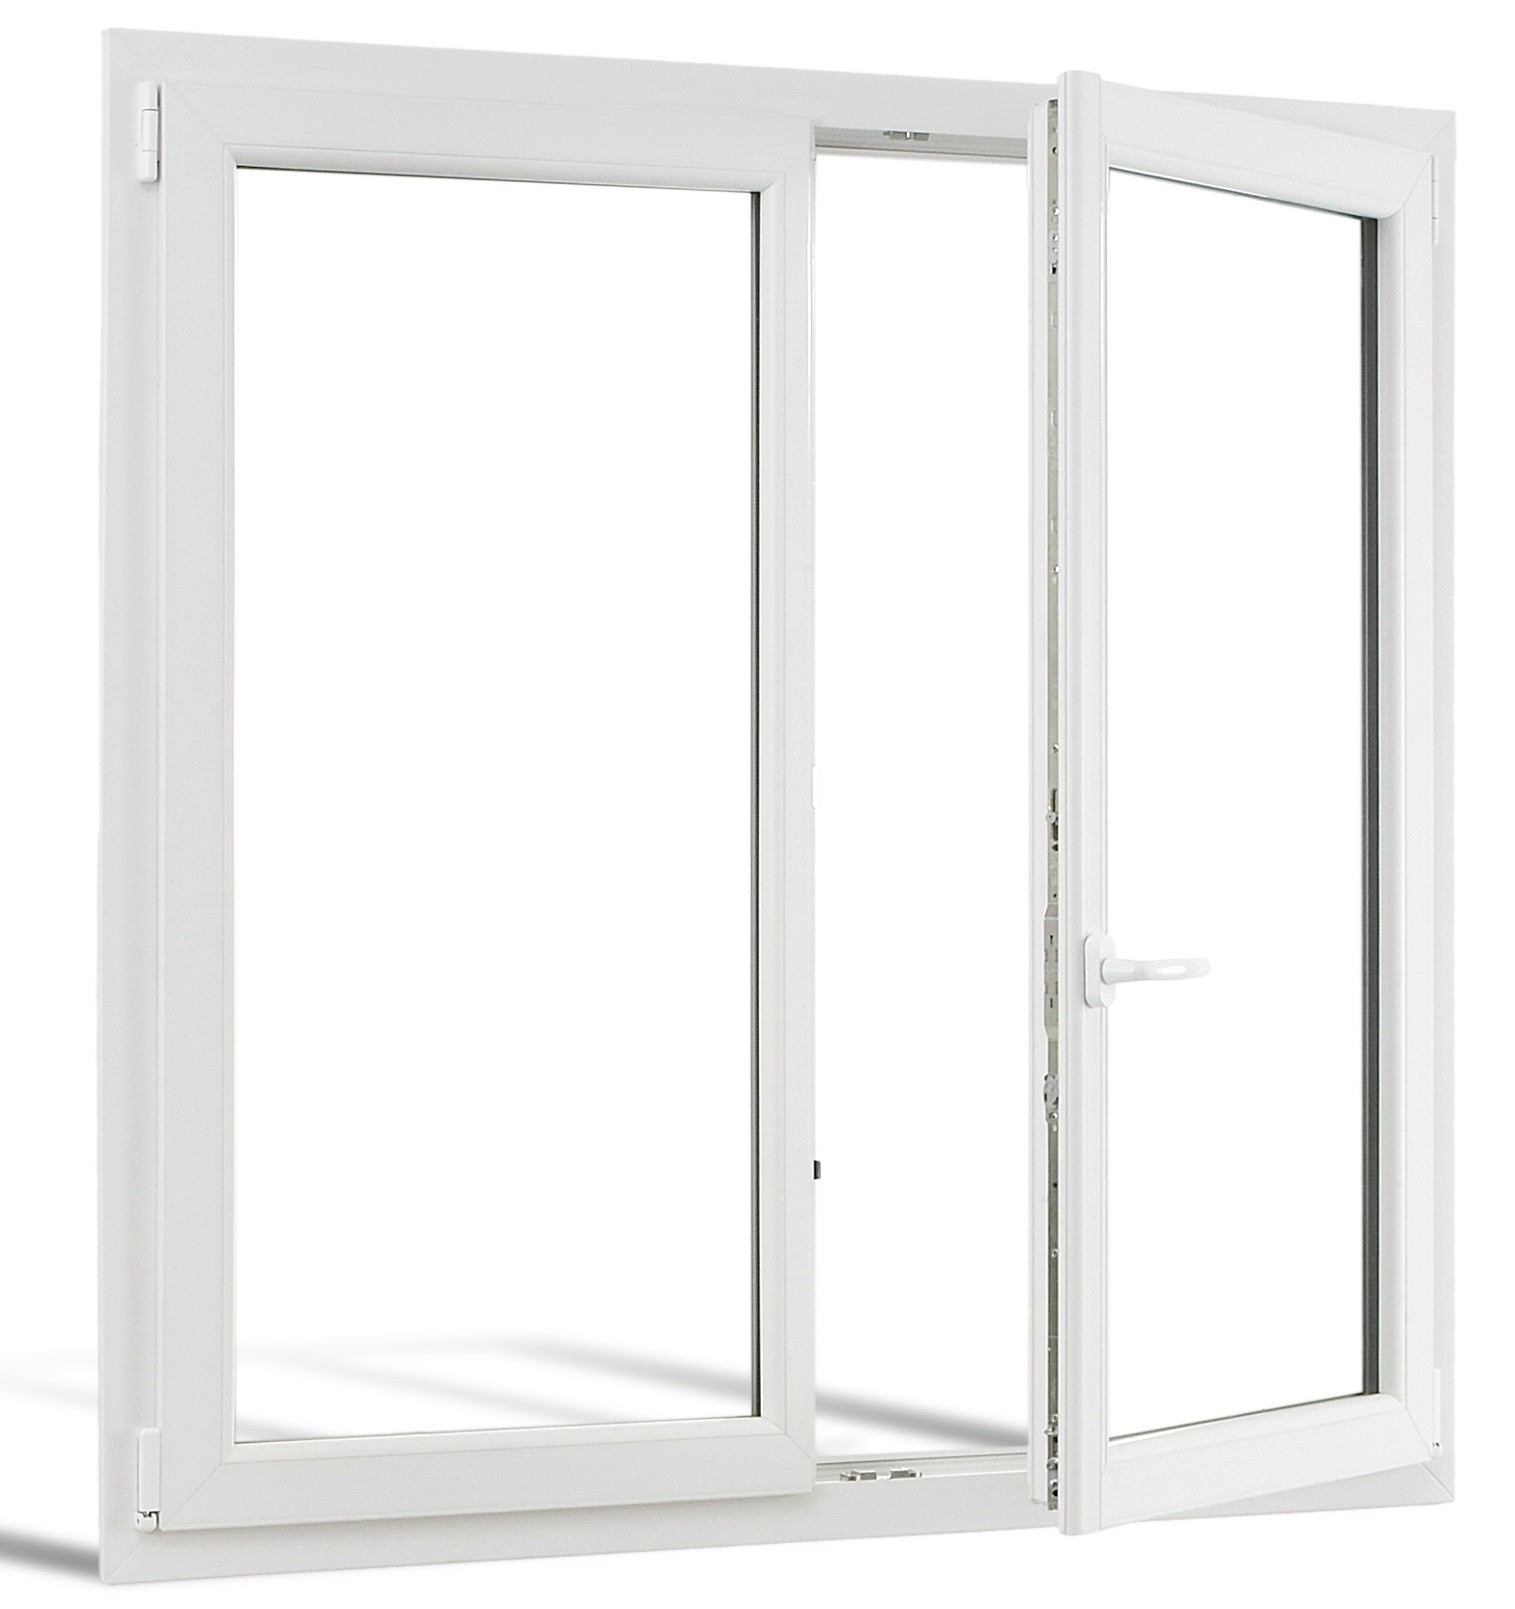 Fen tre pvc grosfilex r f fen tres portes for Fenetre en pvc blanc